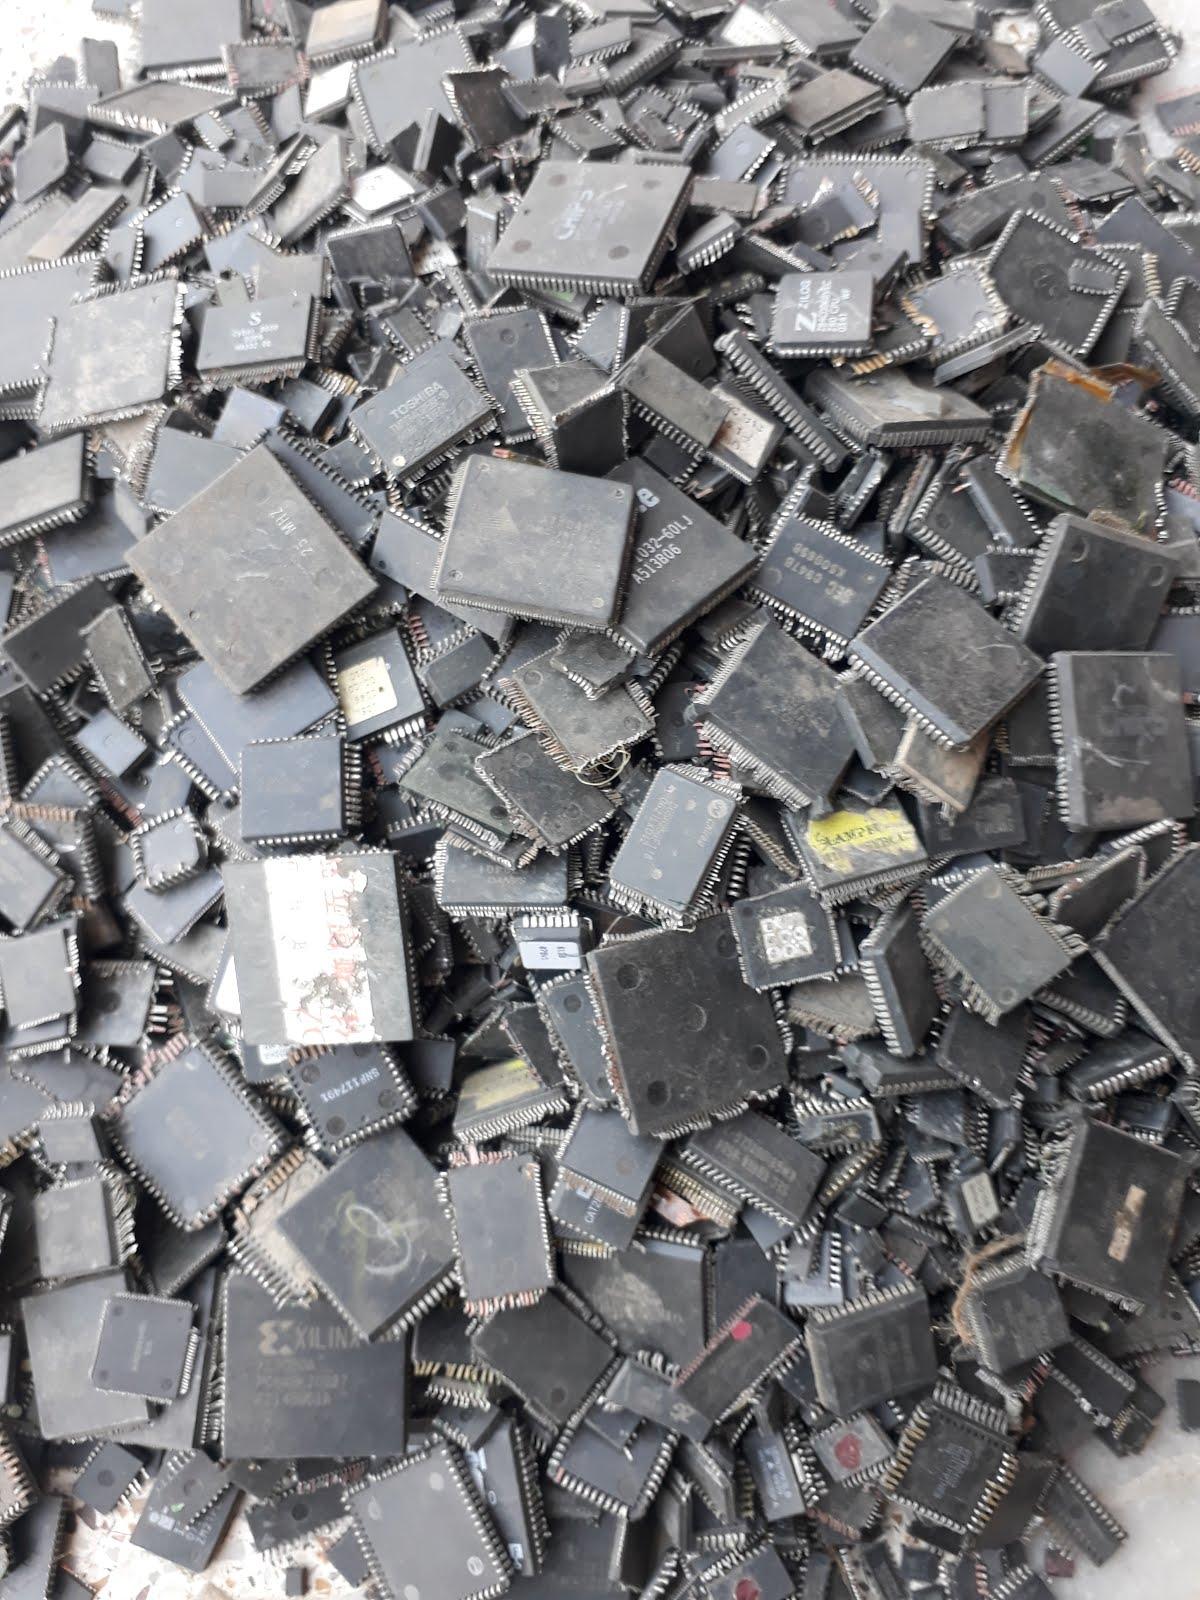 Precious Metal Recovery & Computer Scrap Price